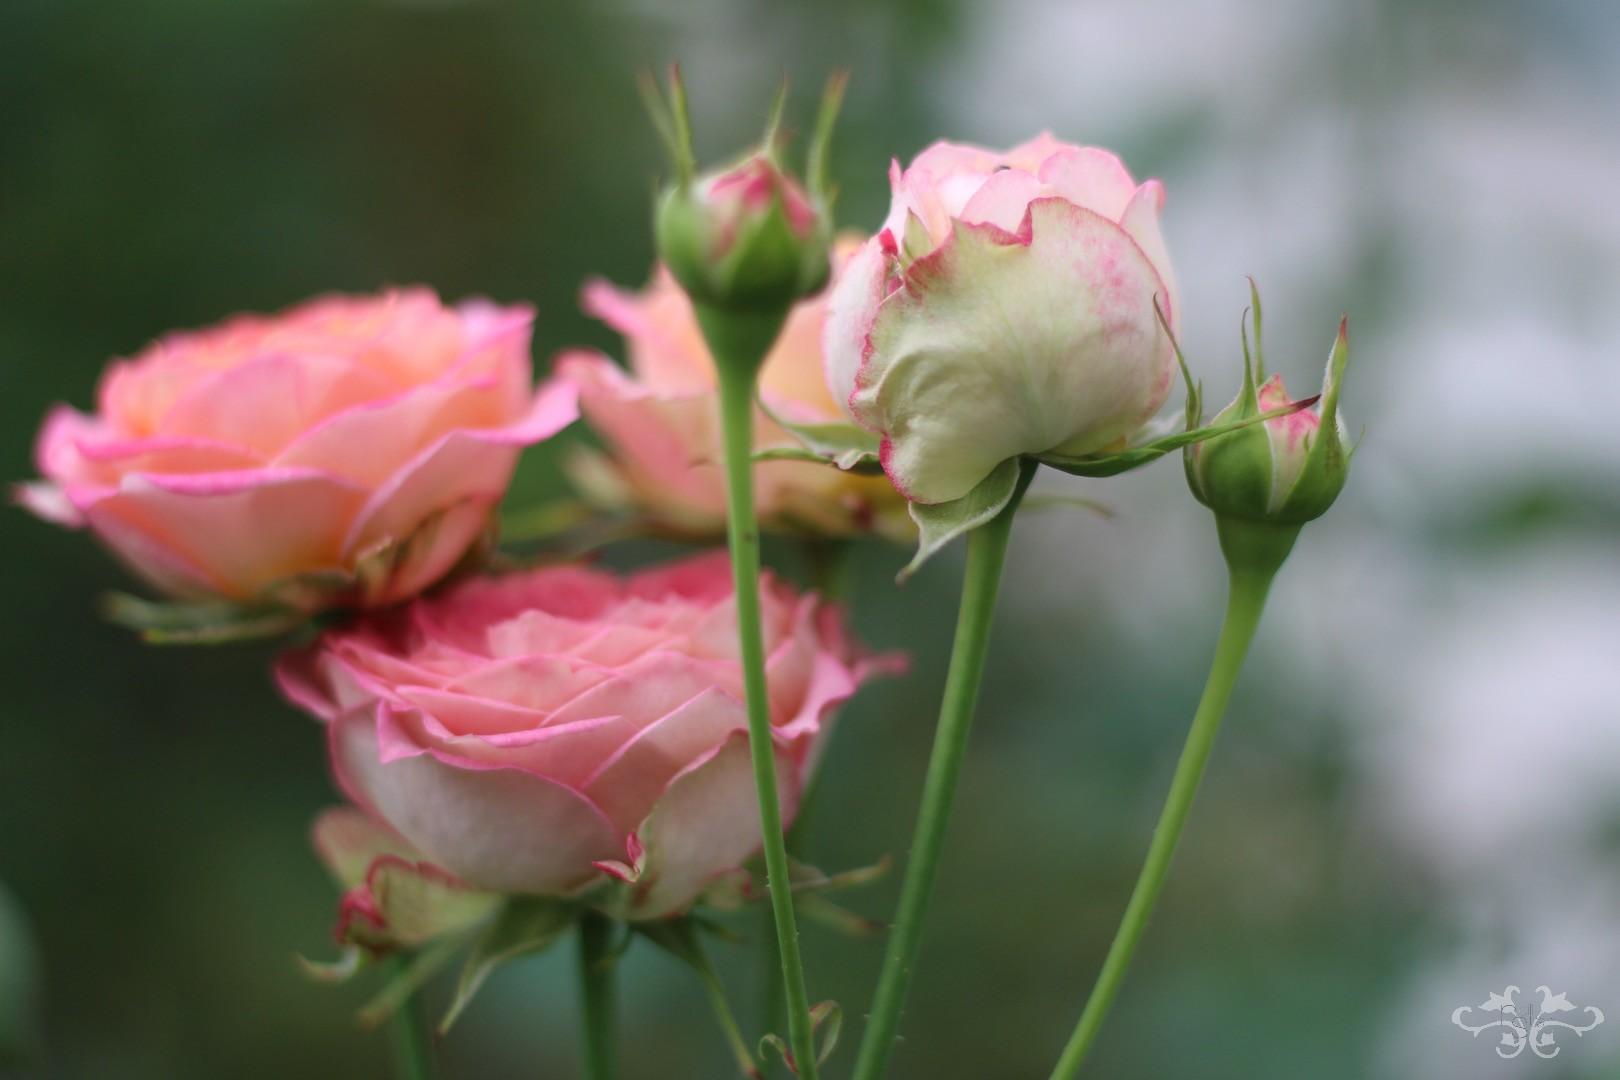 Dozens of new varieties of Roses at the Dutch breeders, De Ruiter, Kordes and Olij